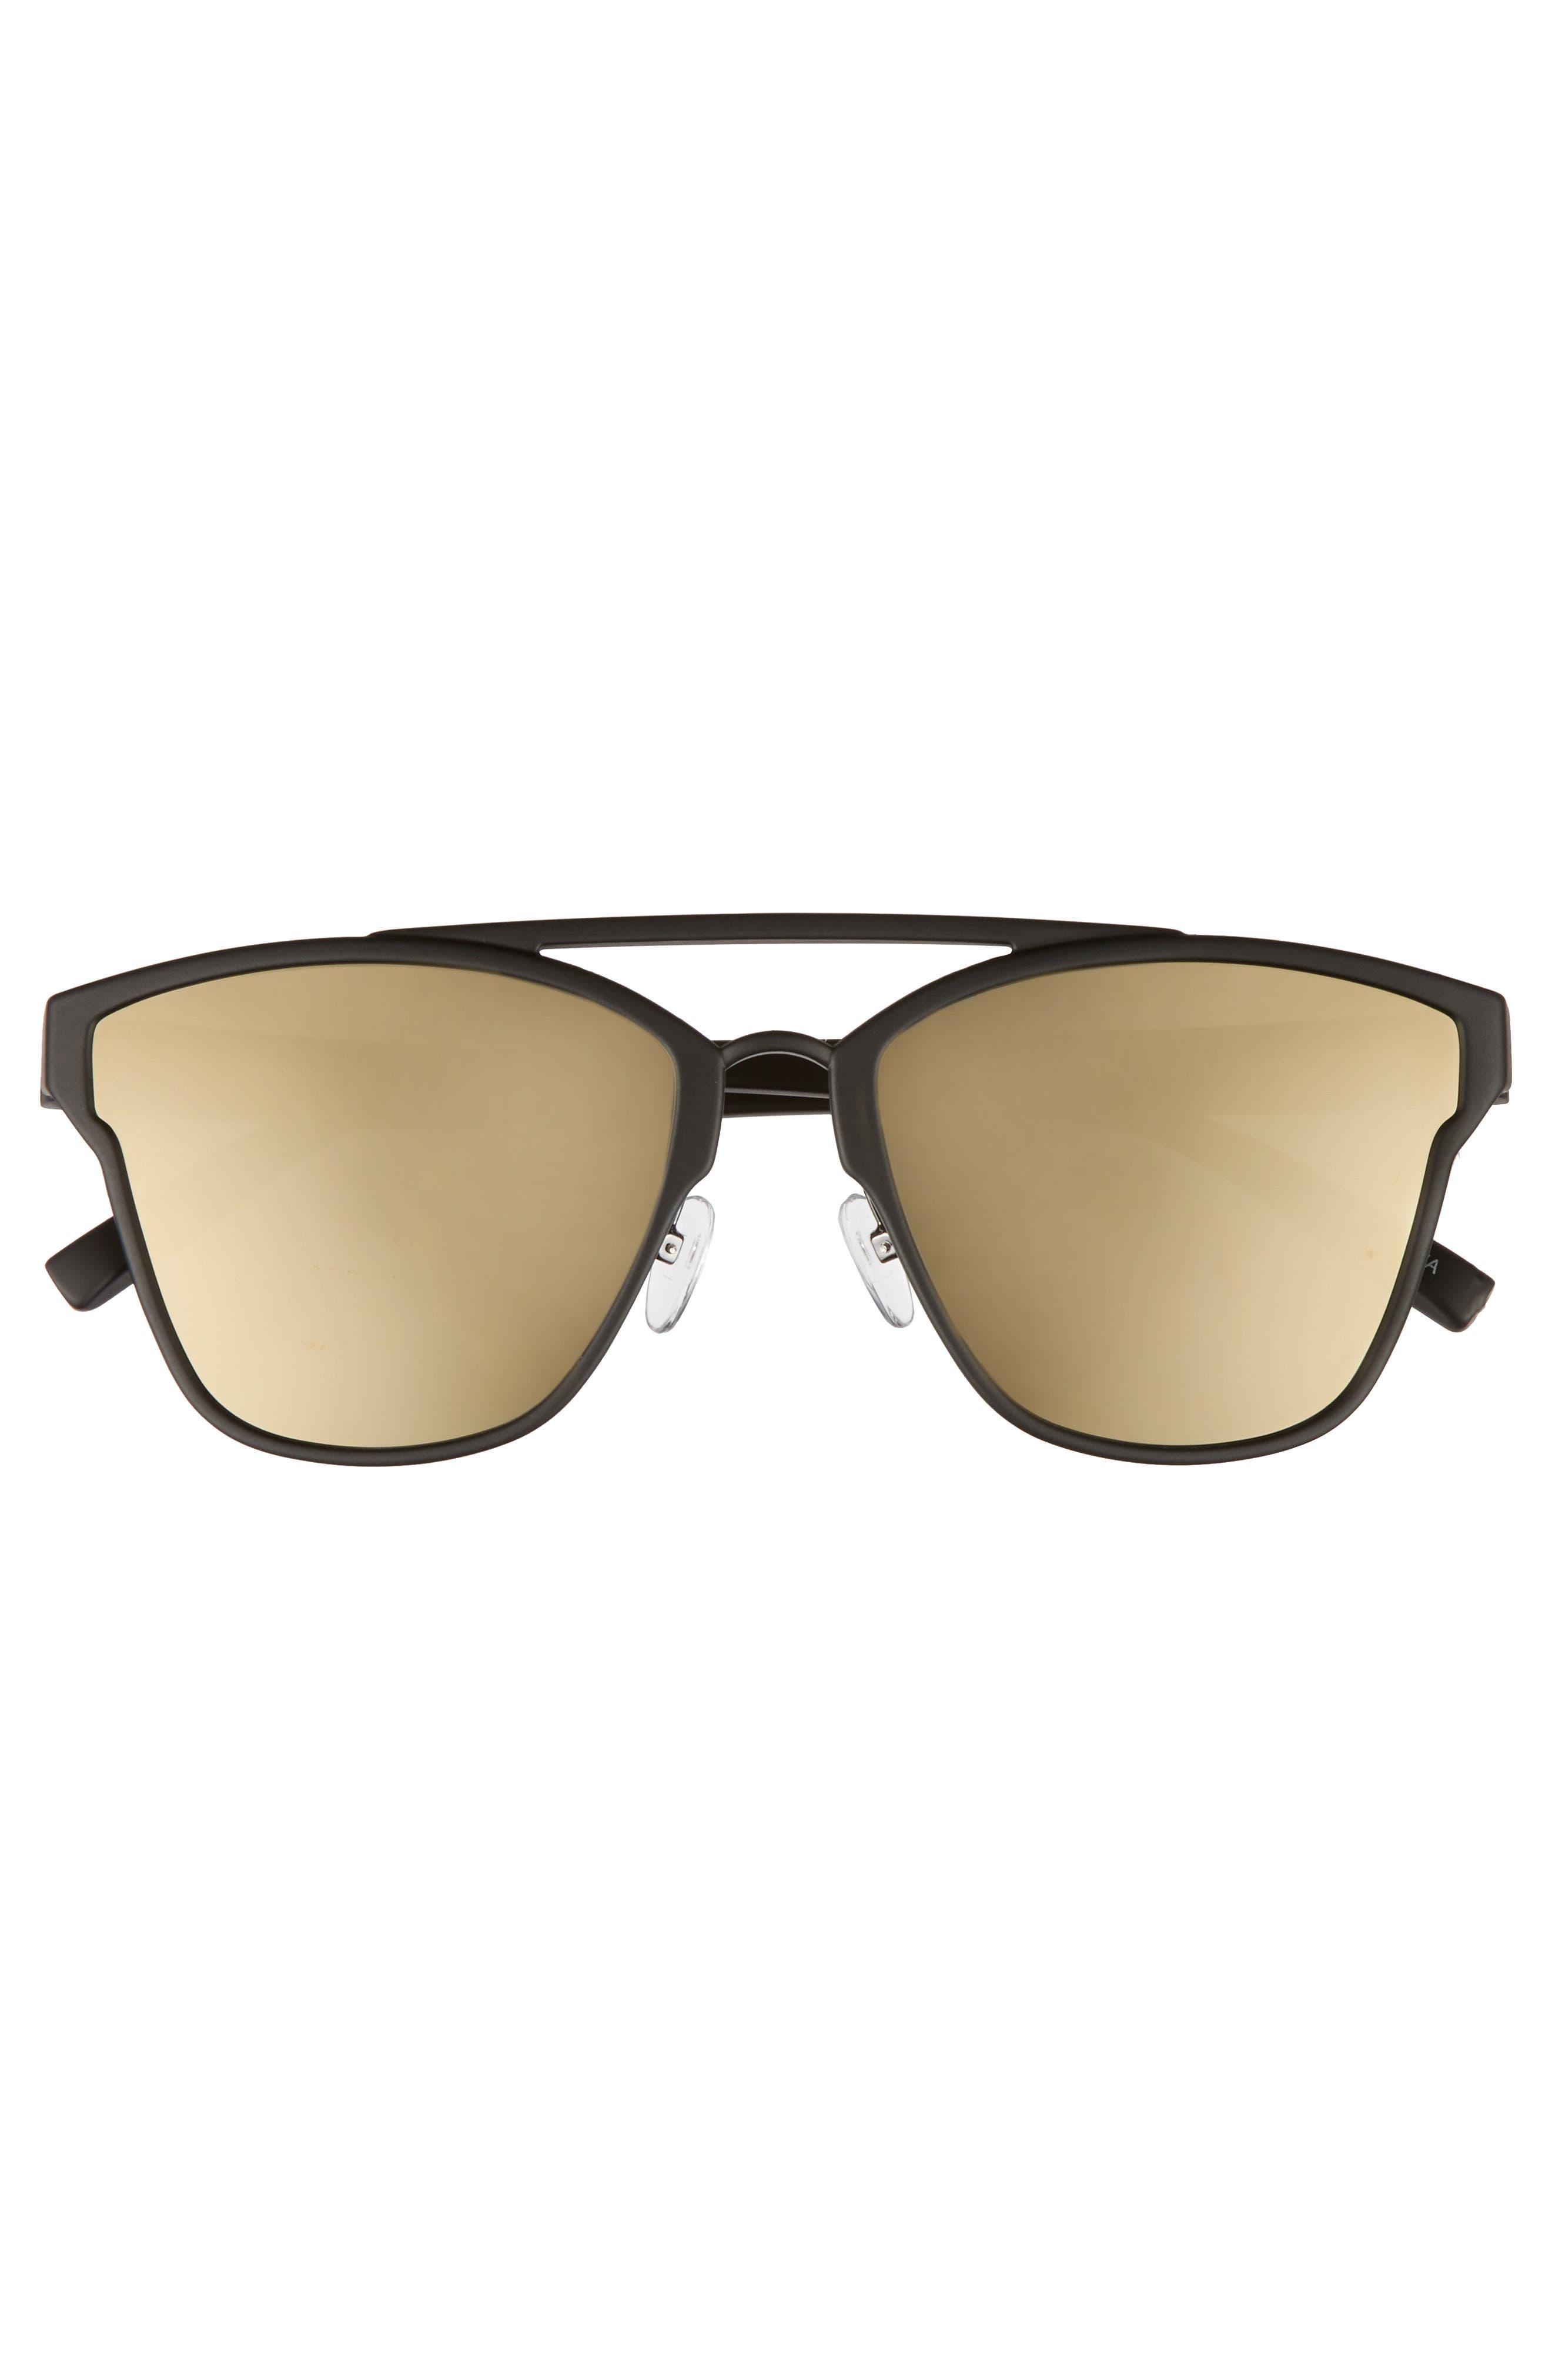 Herstory 55mm Aviator Sunglasses,                             Alternate thumbnail 3, color,                             001